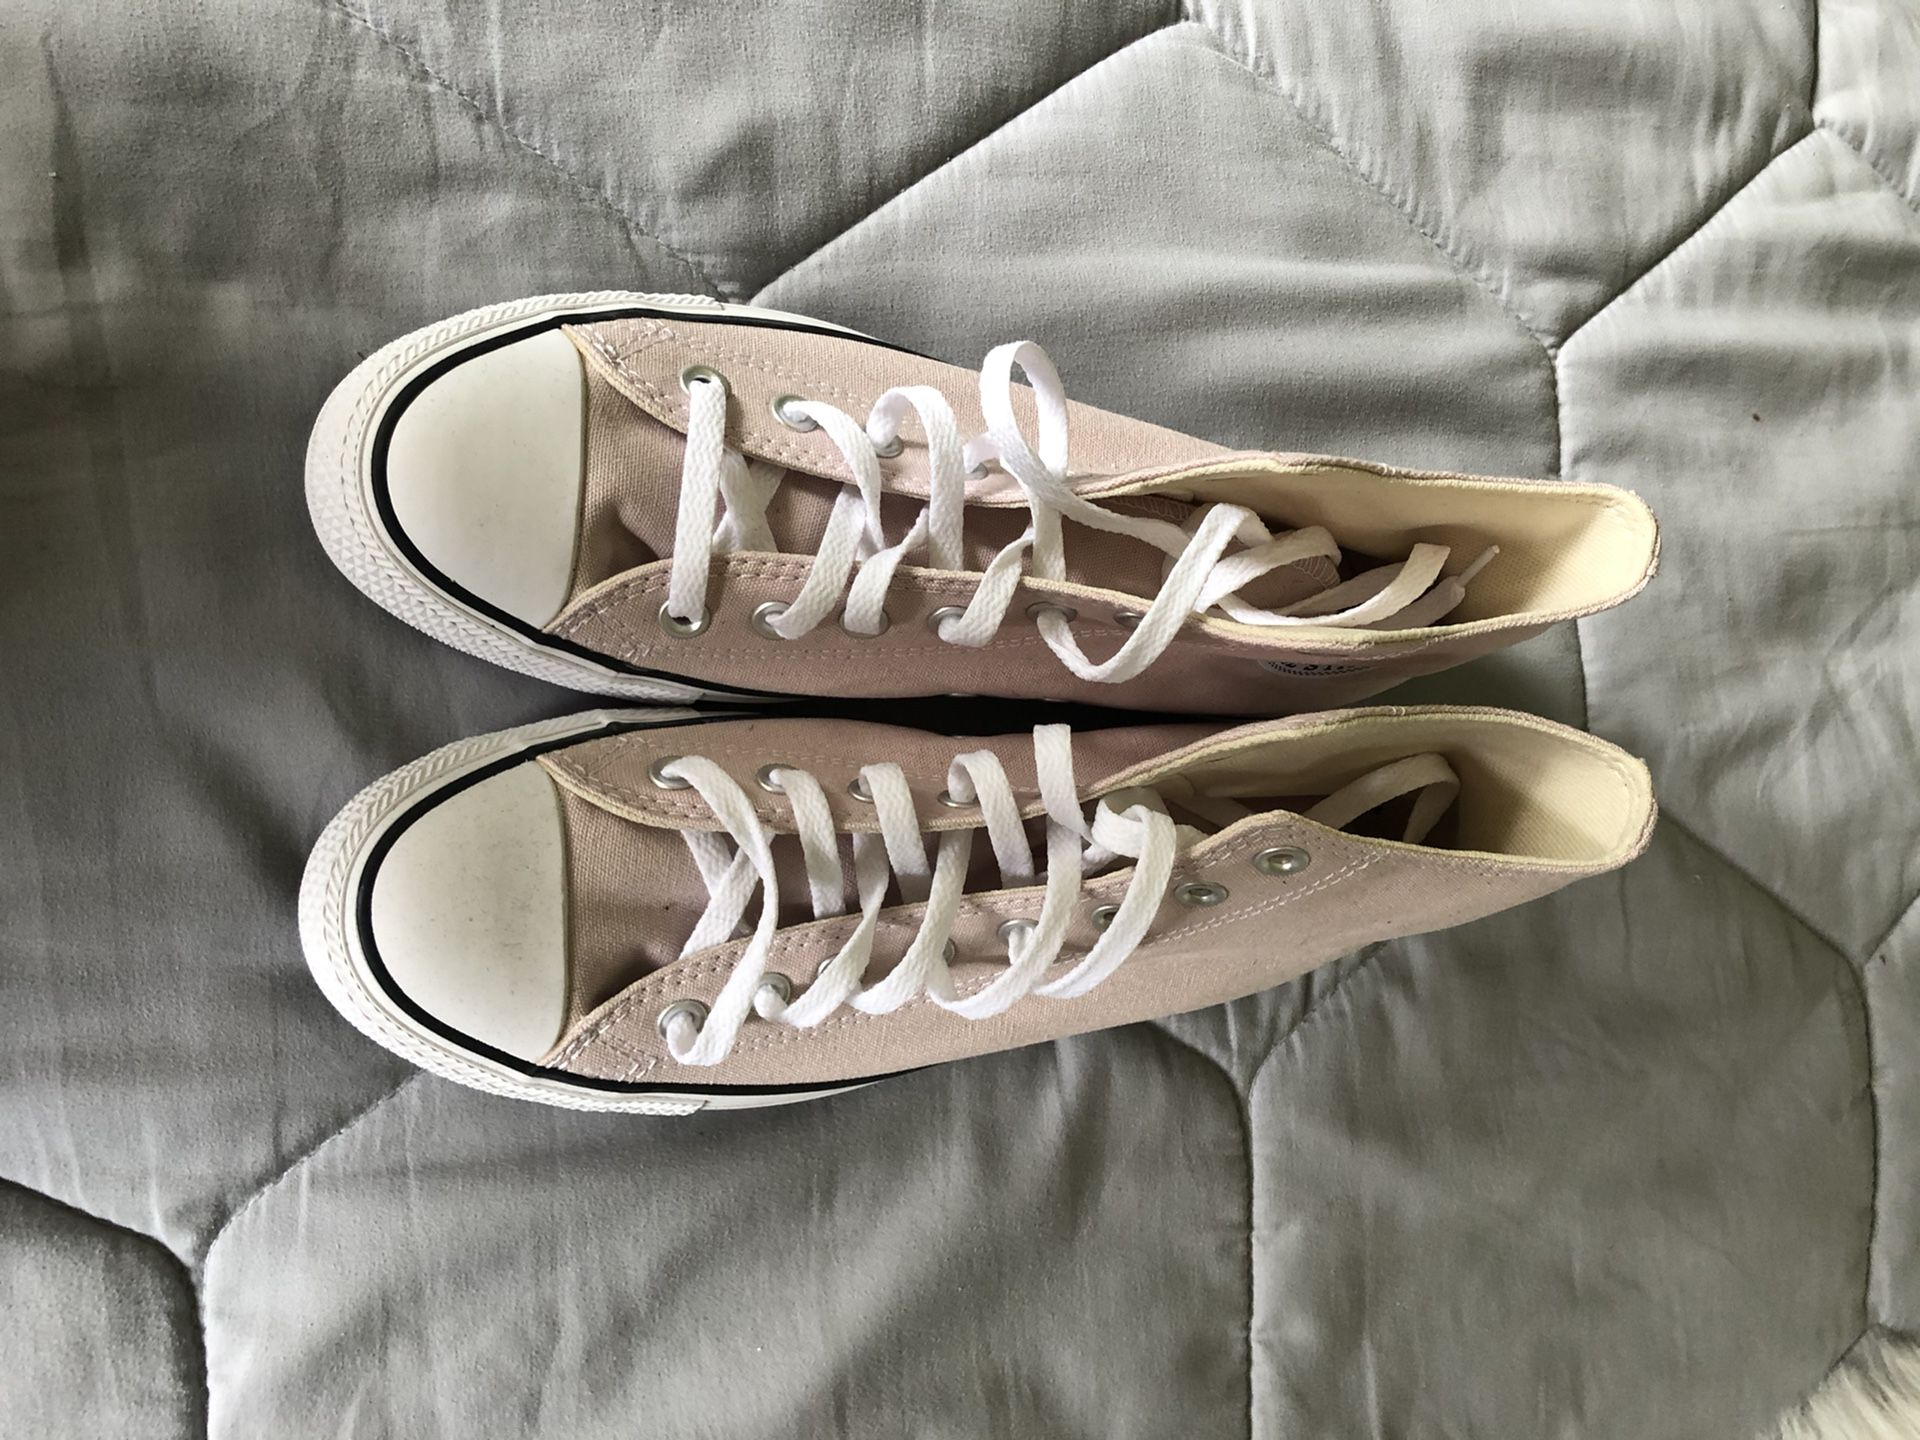 Converse - Blush Pink